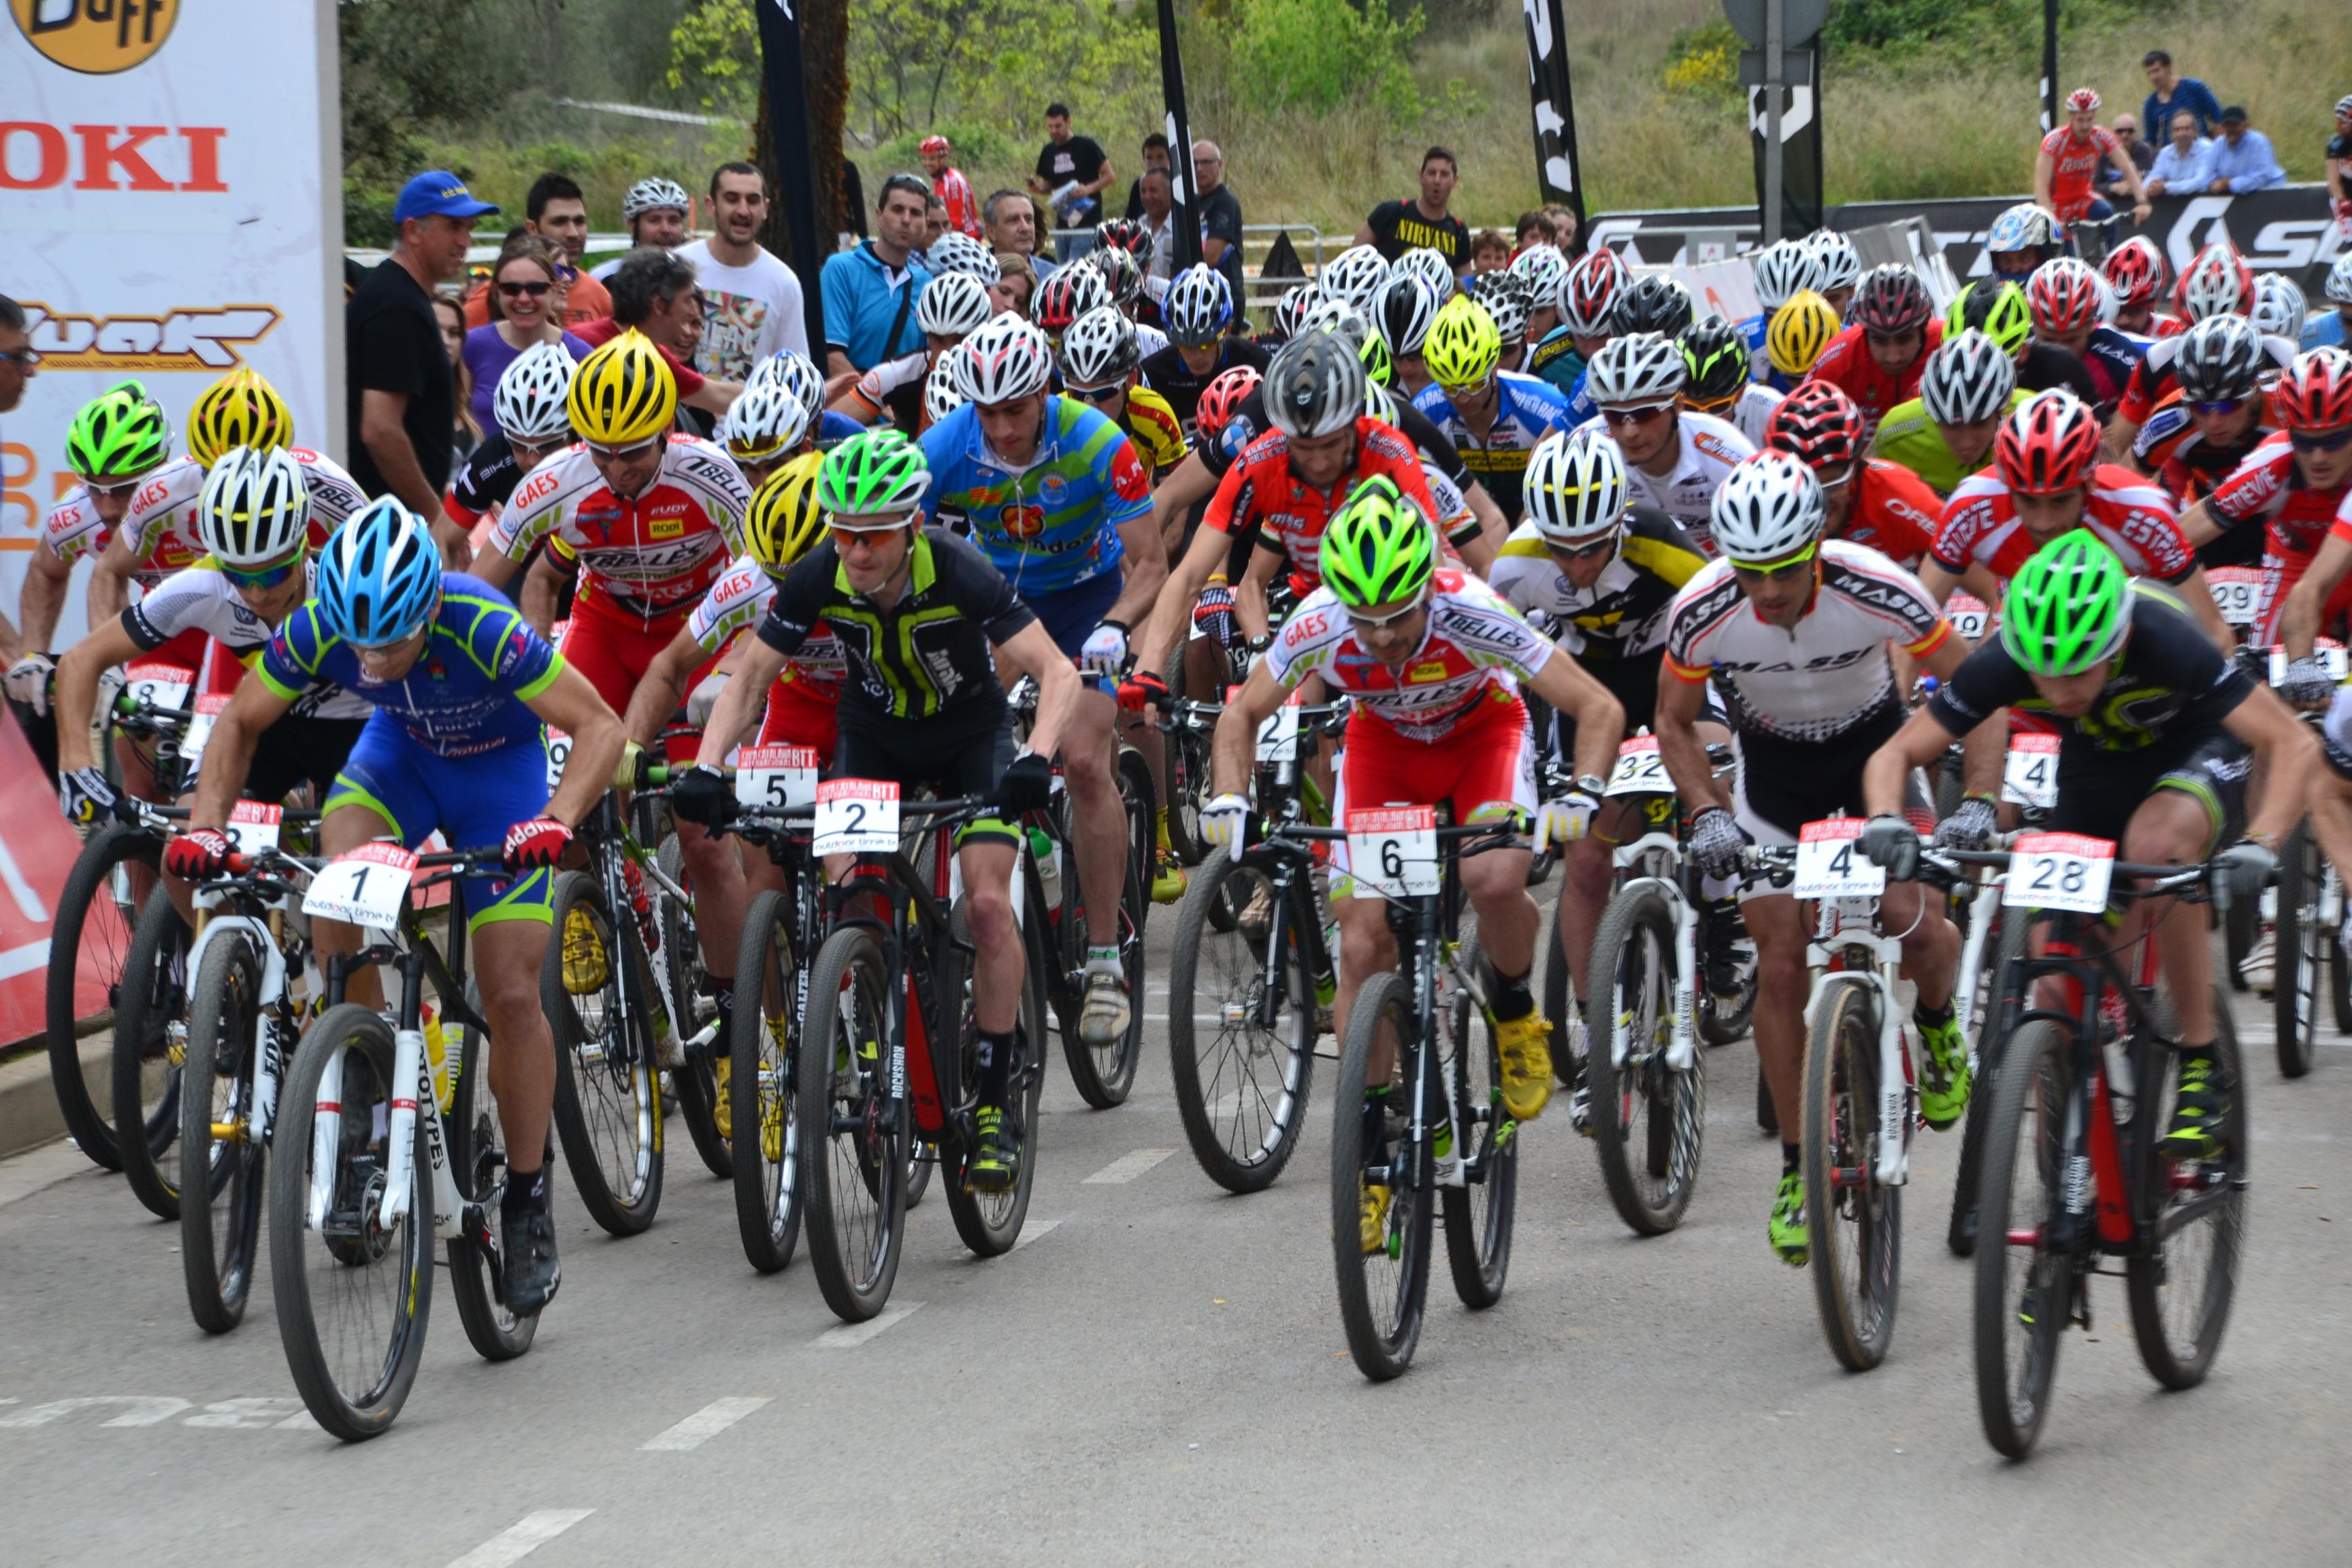 Pen�ltima cita de la Copa Catalana Internacional de BTT Biking Point en Igualada